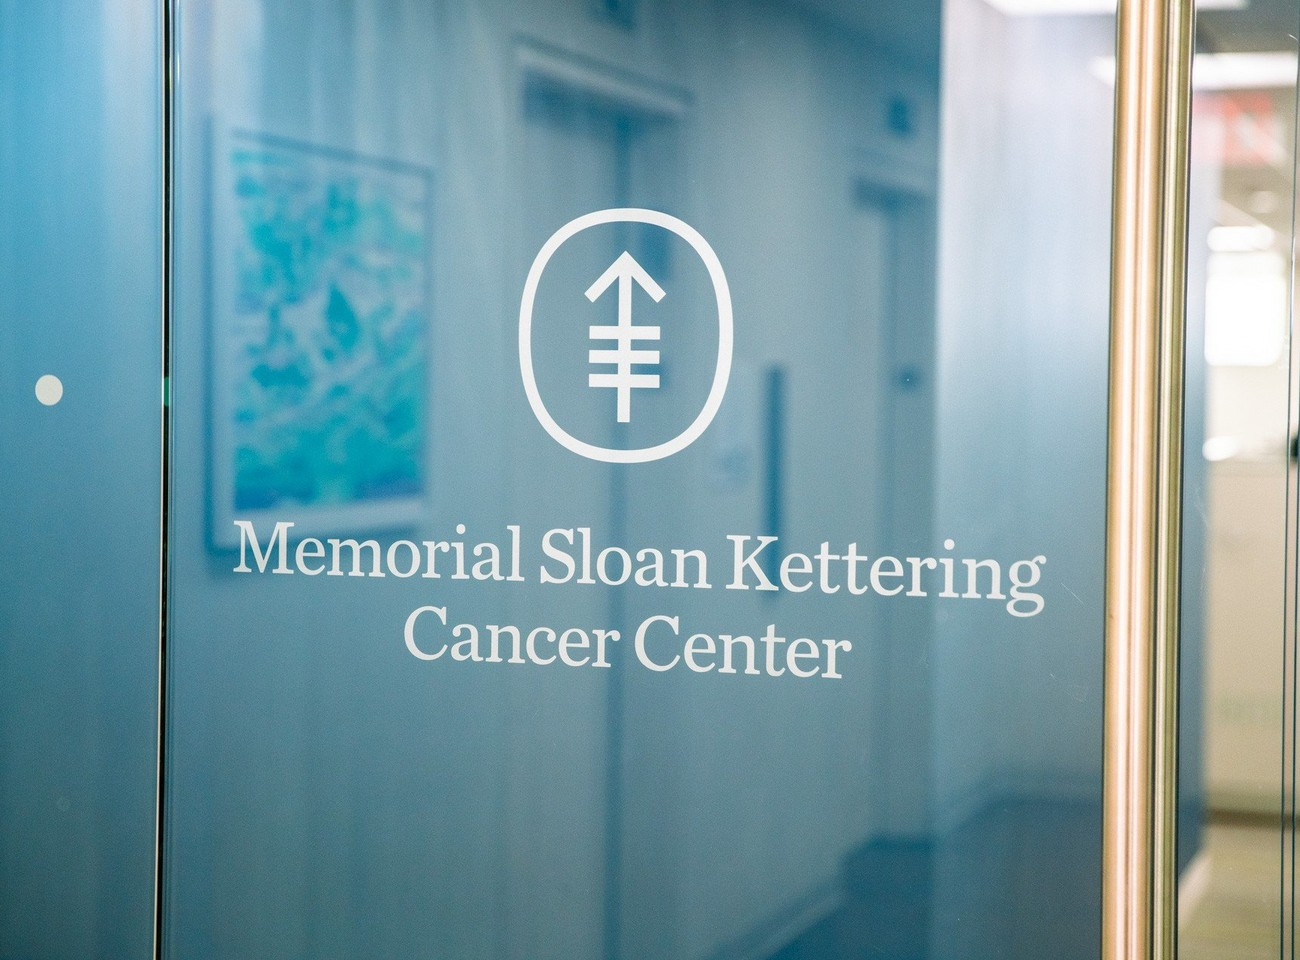 Memorial Sloan Kettering Cancer Center Careers